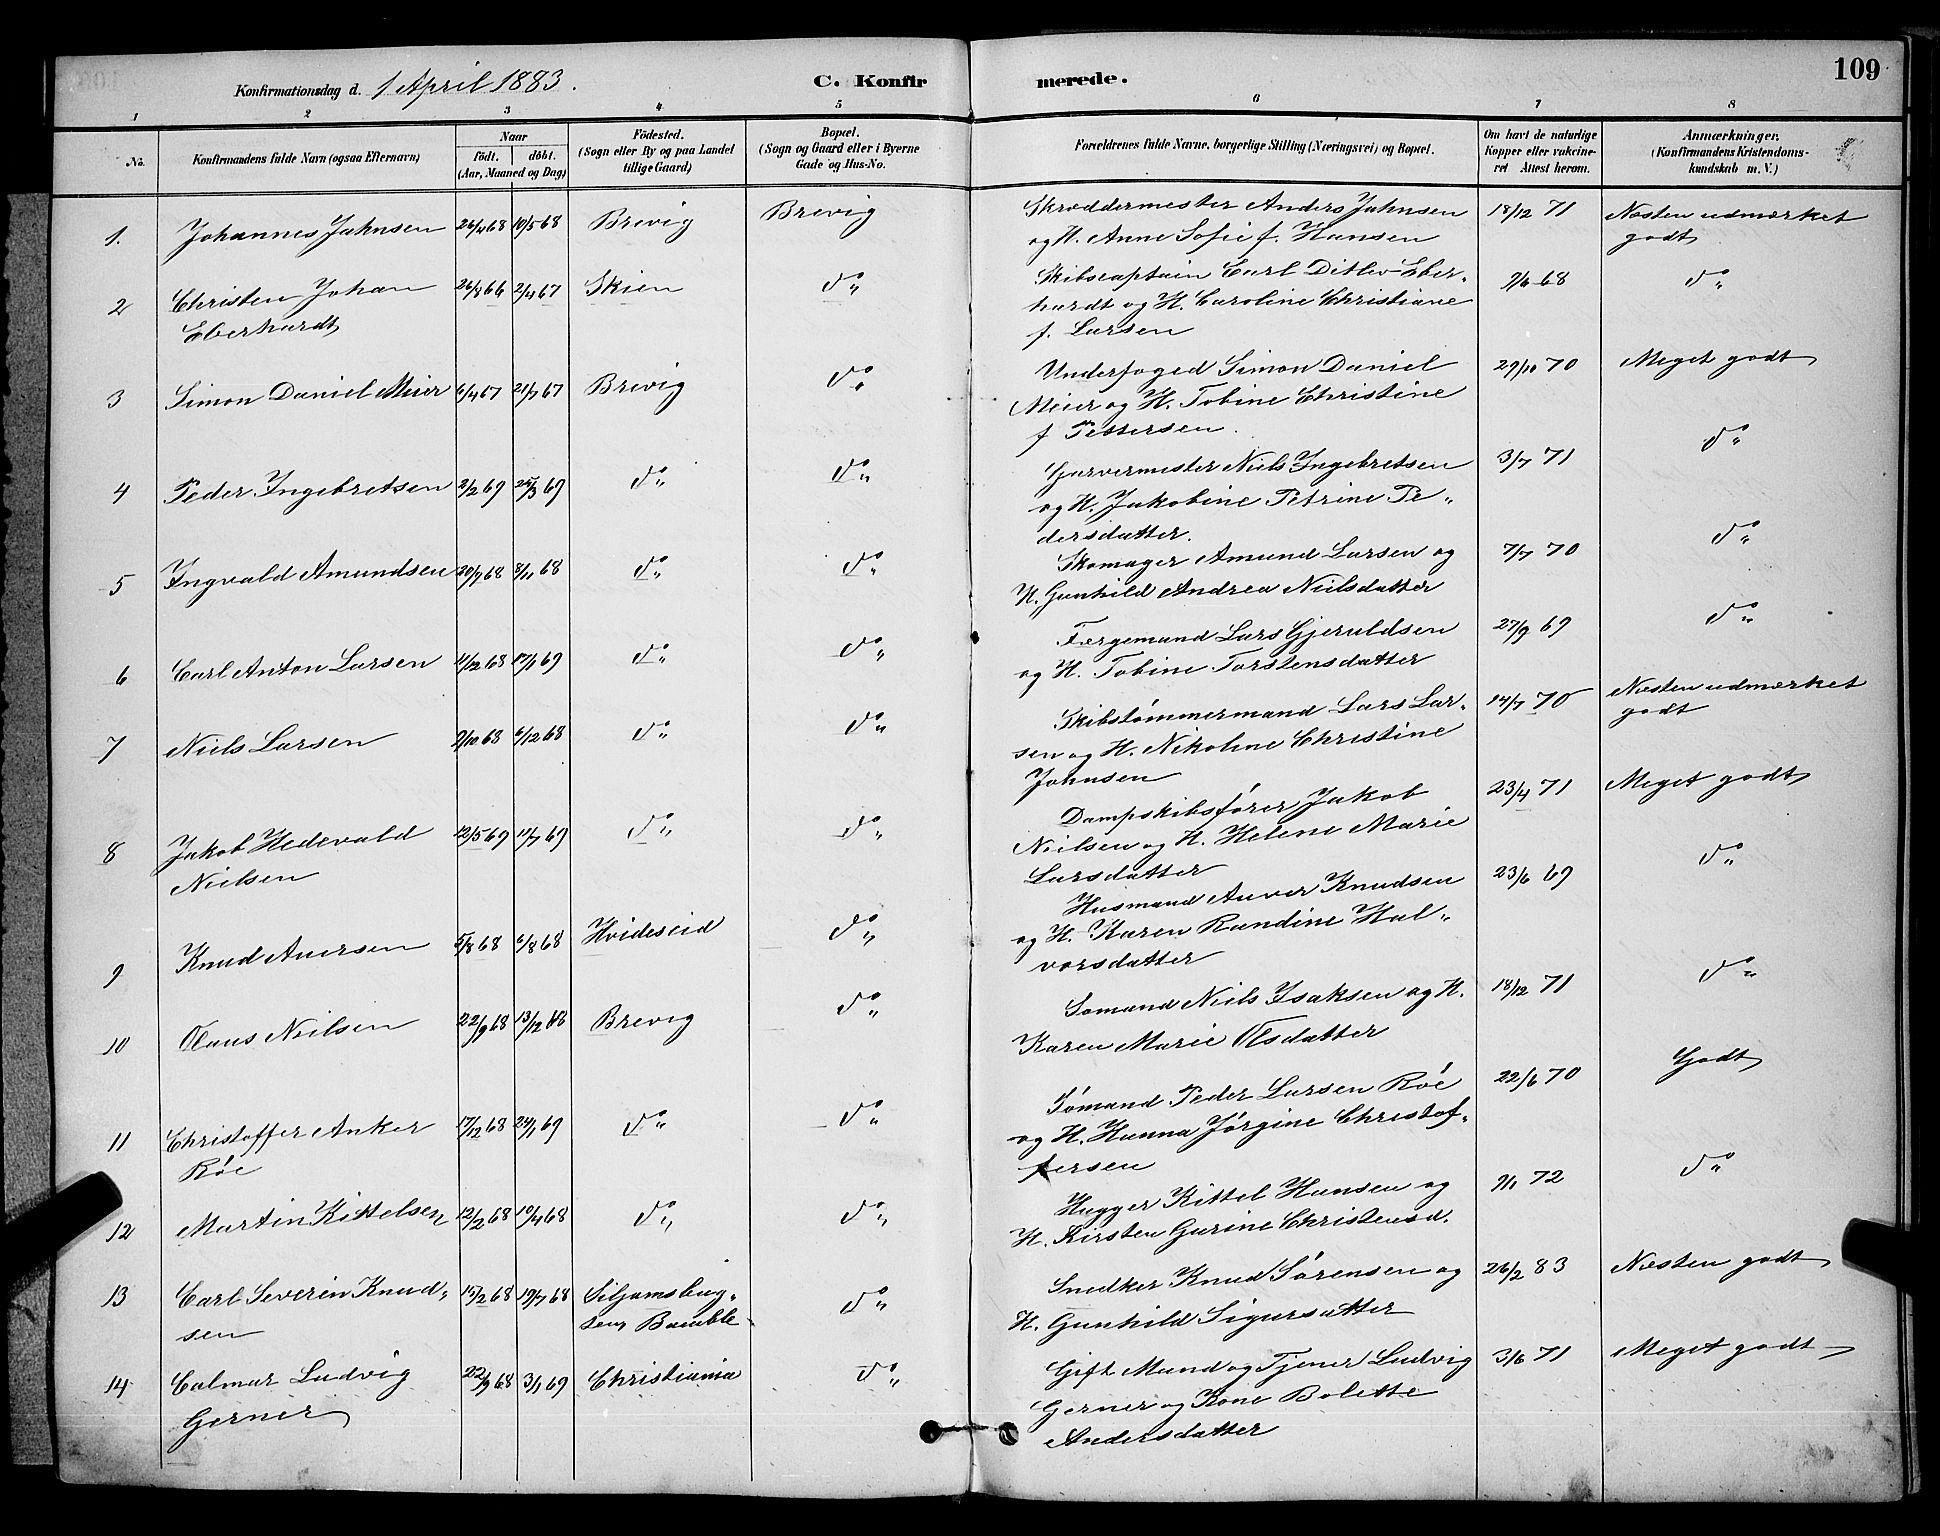 SAKO, Brevik kirkebøker, G/Ga/L0004: Klokkerbok nr. 4, 1882-1900, s. 109